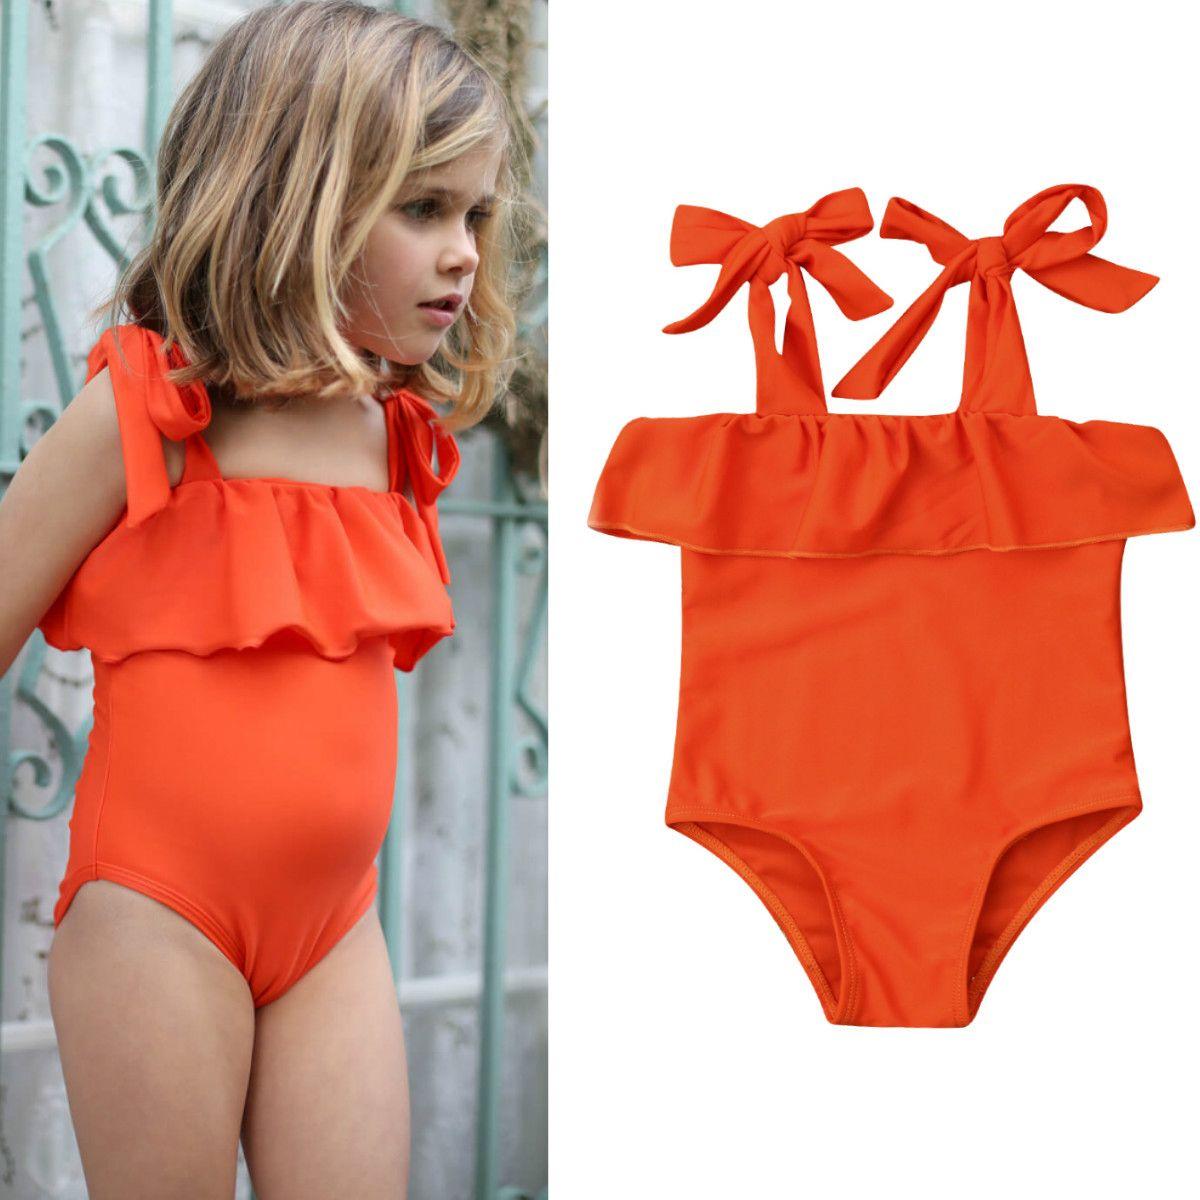 3df014a2fd3 2019 2019 New Baby Kid Girls Swimwear Summer Ruffles One Piece Bikini  Swimsuit Beach Bathing Suit Baby Girl Clothes 0 5T From Babieskids, $4.11 |  DHgate.Com